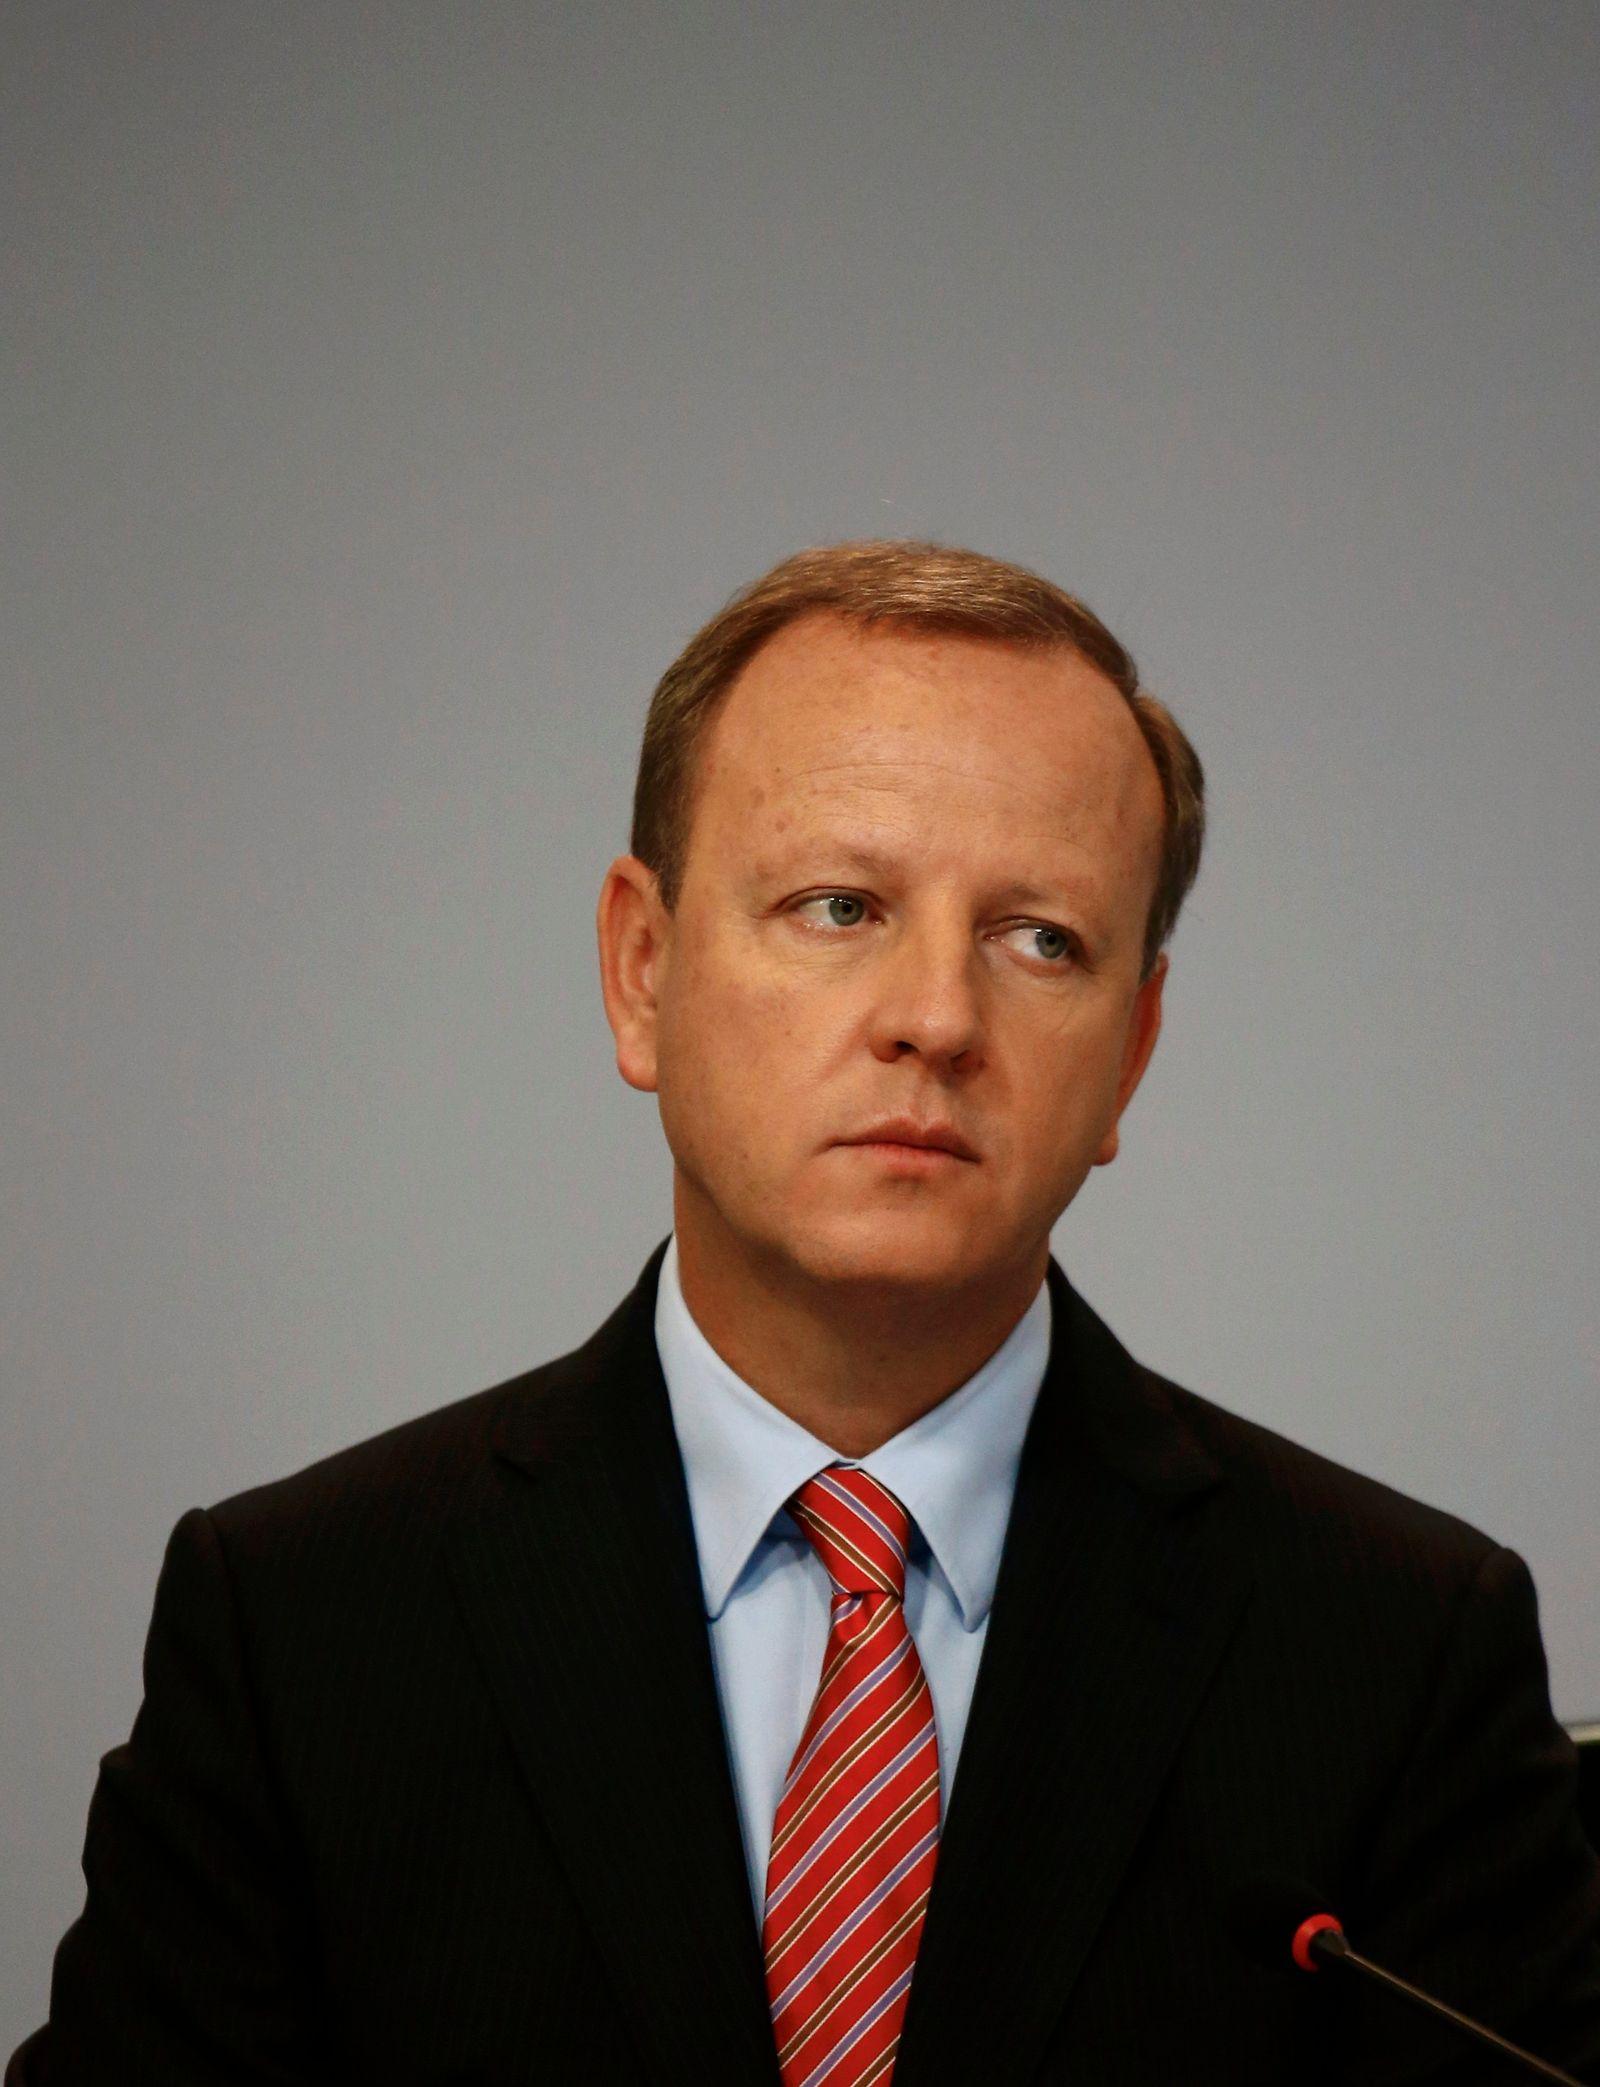 Krause, CFO of Deutsche Bank, attends a news conference in Frankfurt